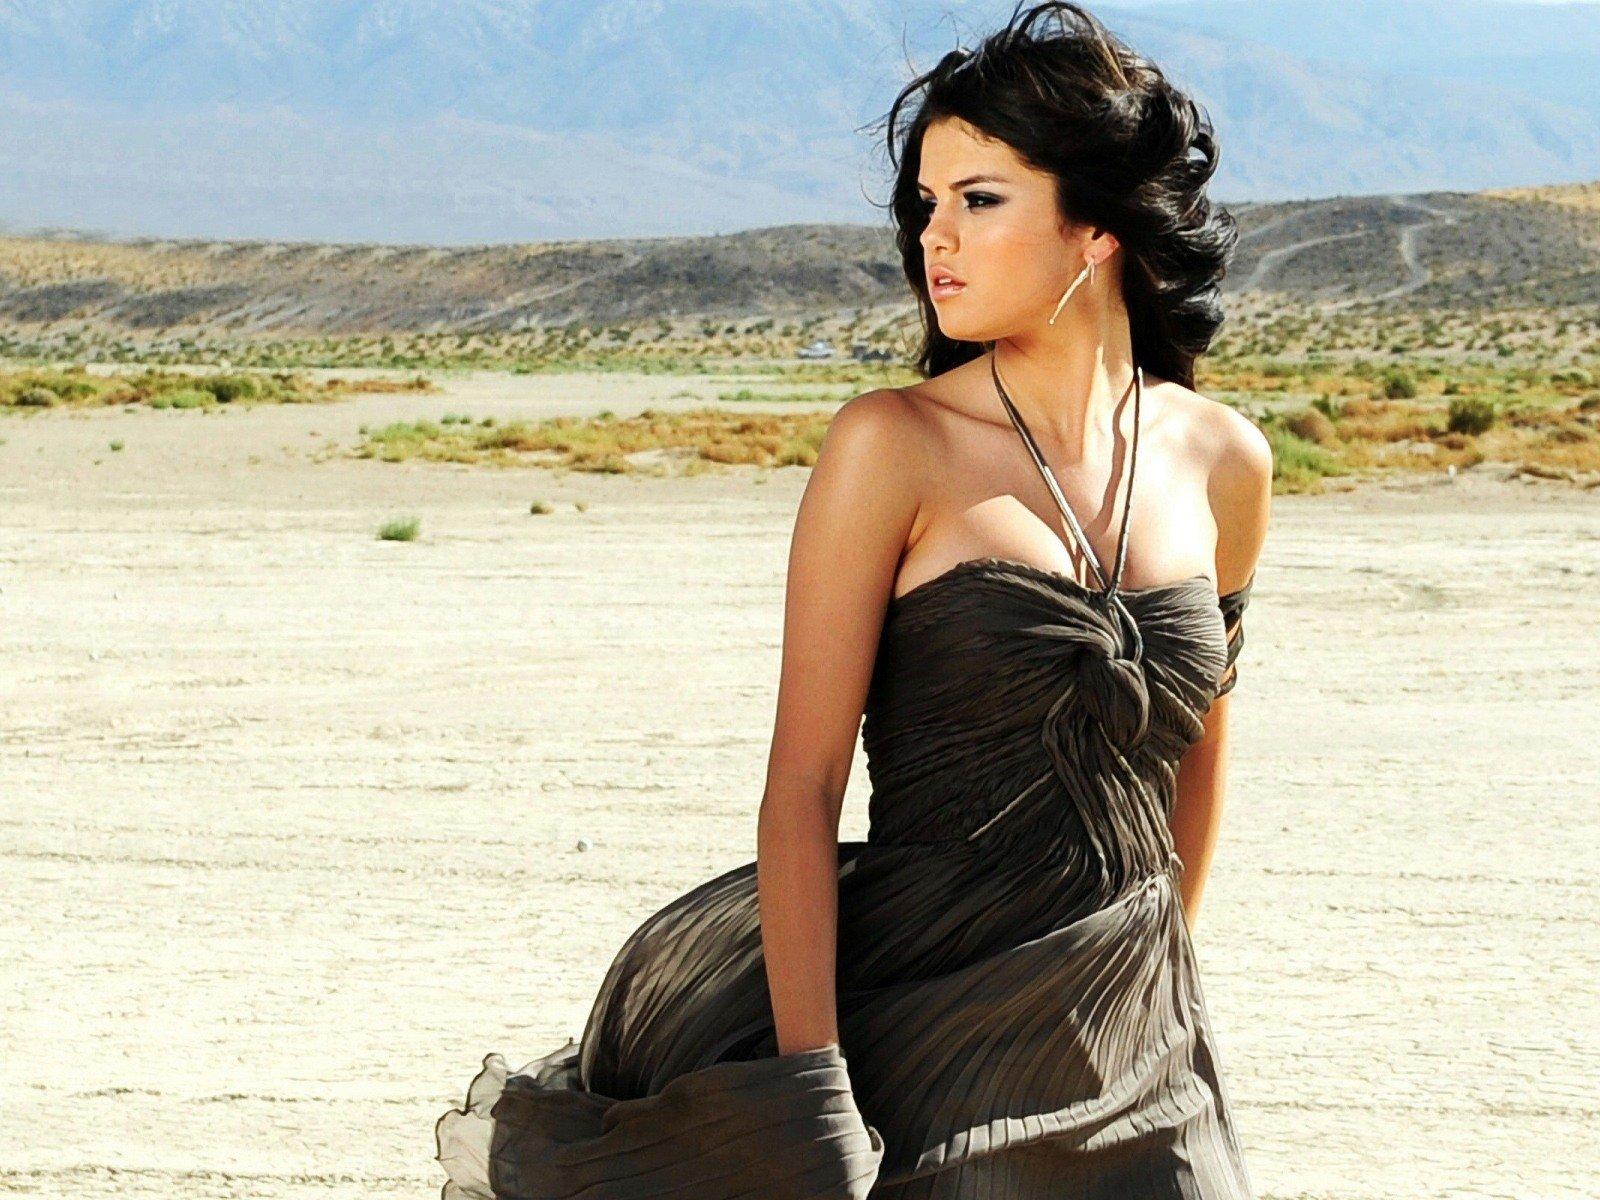 http://4.bp.blogspot.com/-MvNSJuKY8Rs/TwhHkgMpRgI/AAAAAAAABUo/dt30SI2lTsc/s1600/Selena-Gomez-wallpapers-Selena-Gomez-HD-Wallpaper-Hot-Selena-wallpaper-1600-1200.jpg